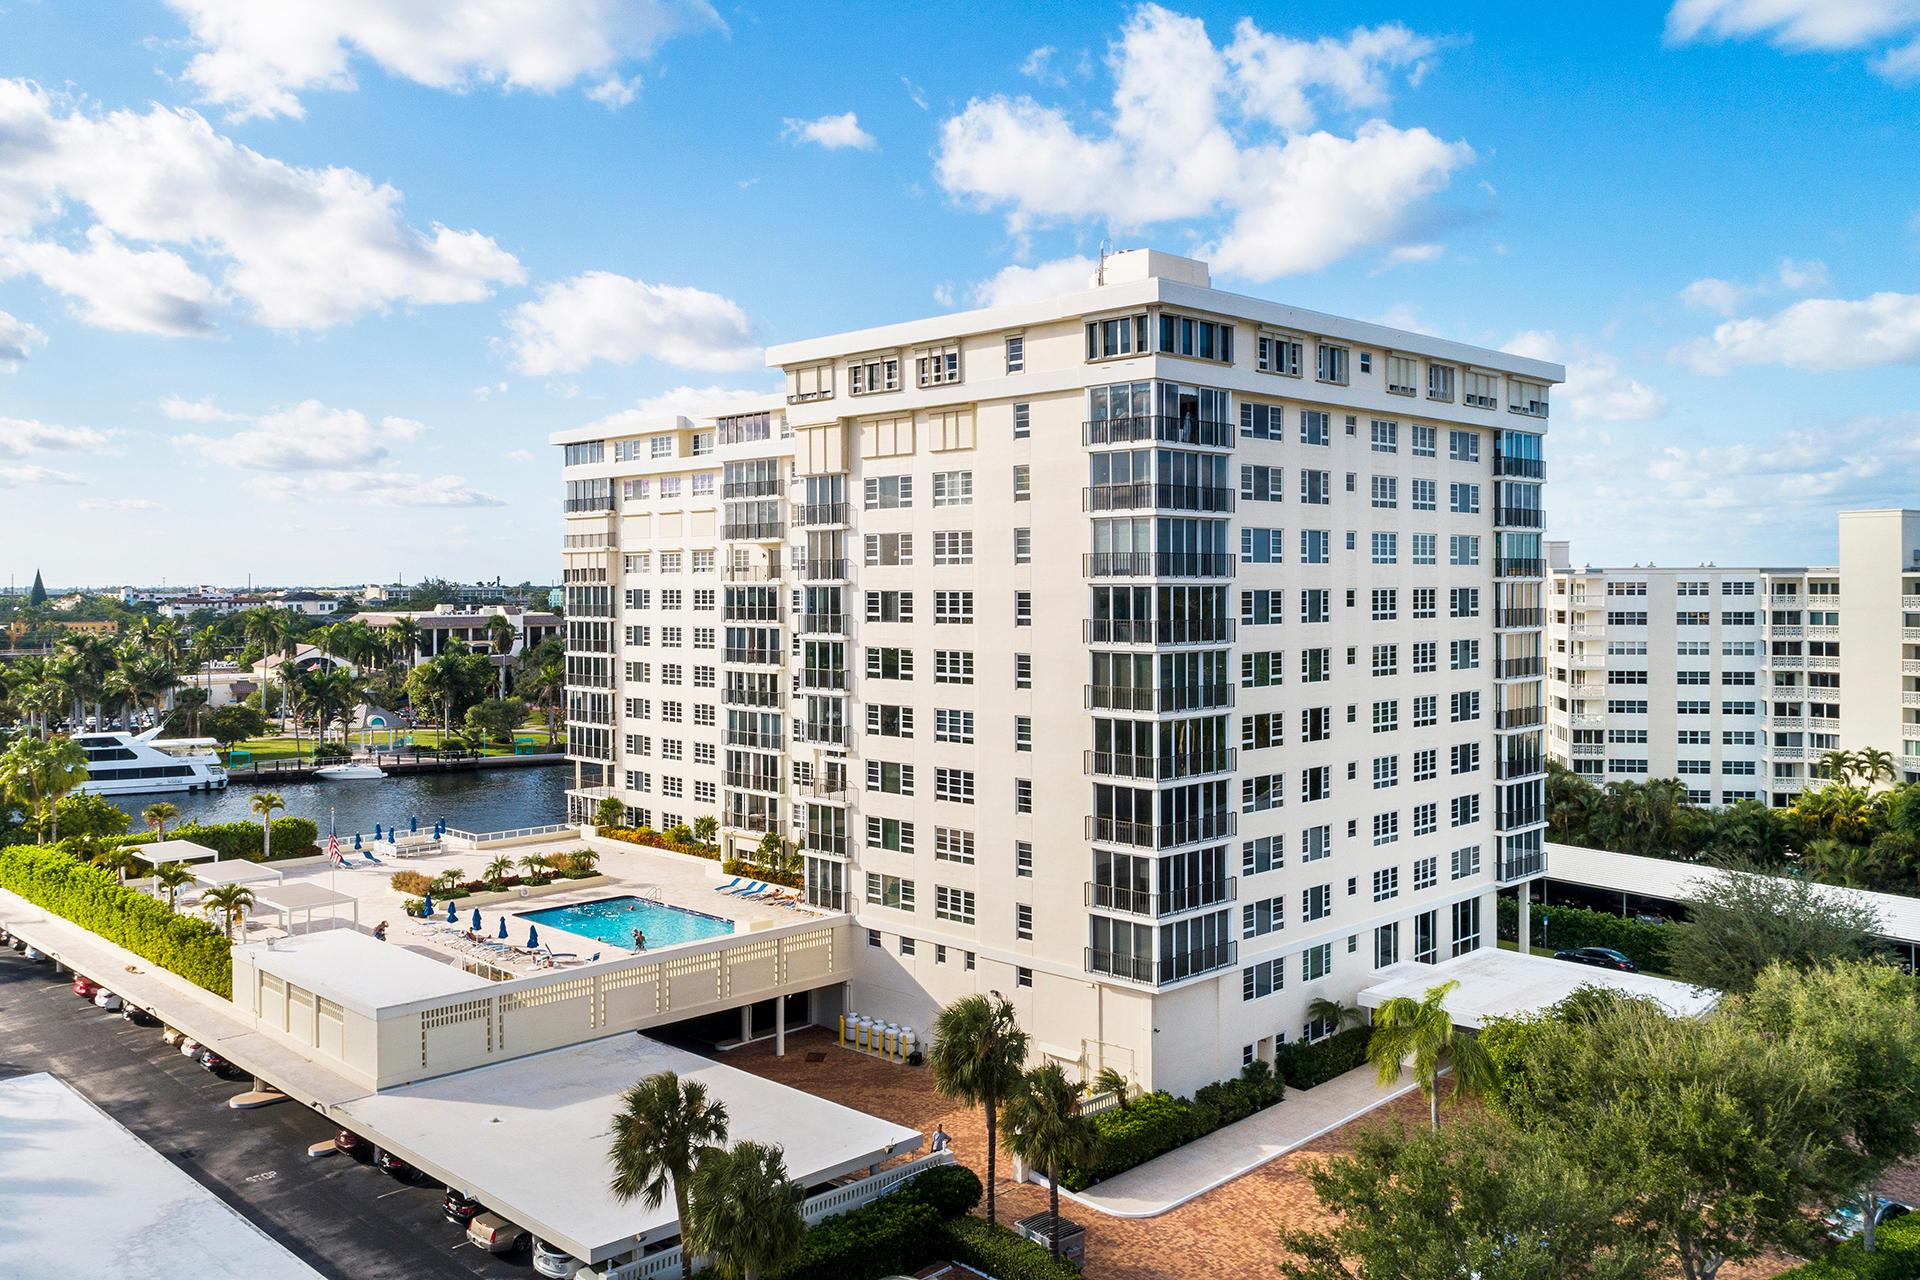 50 East 9d Delray Beach FL 33483